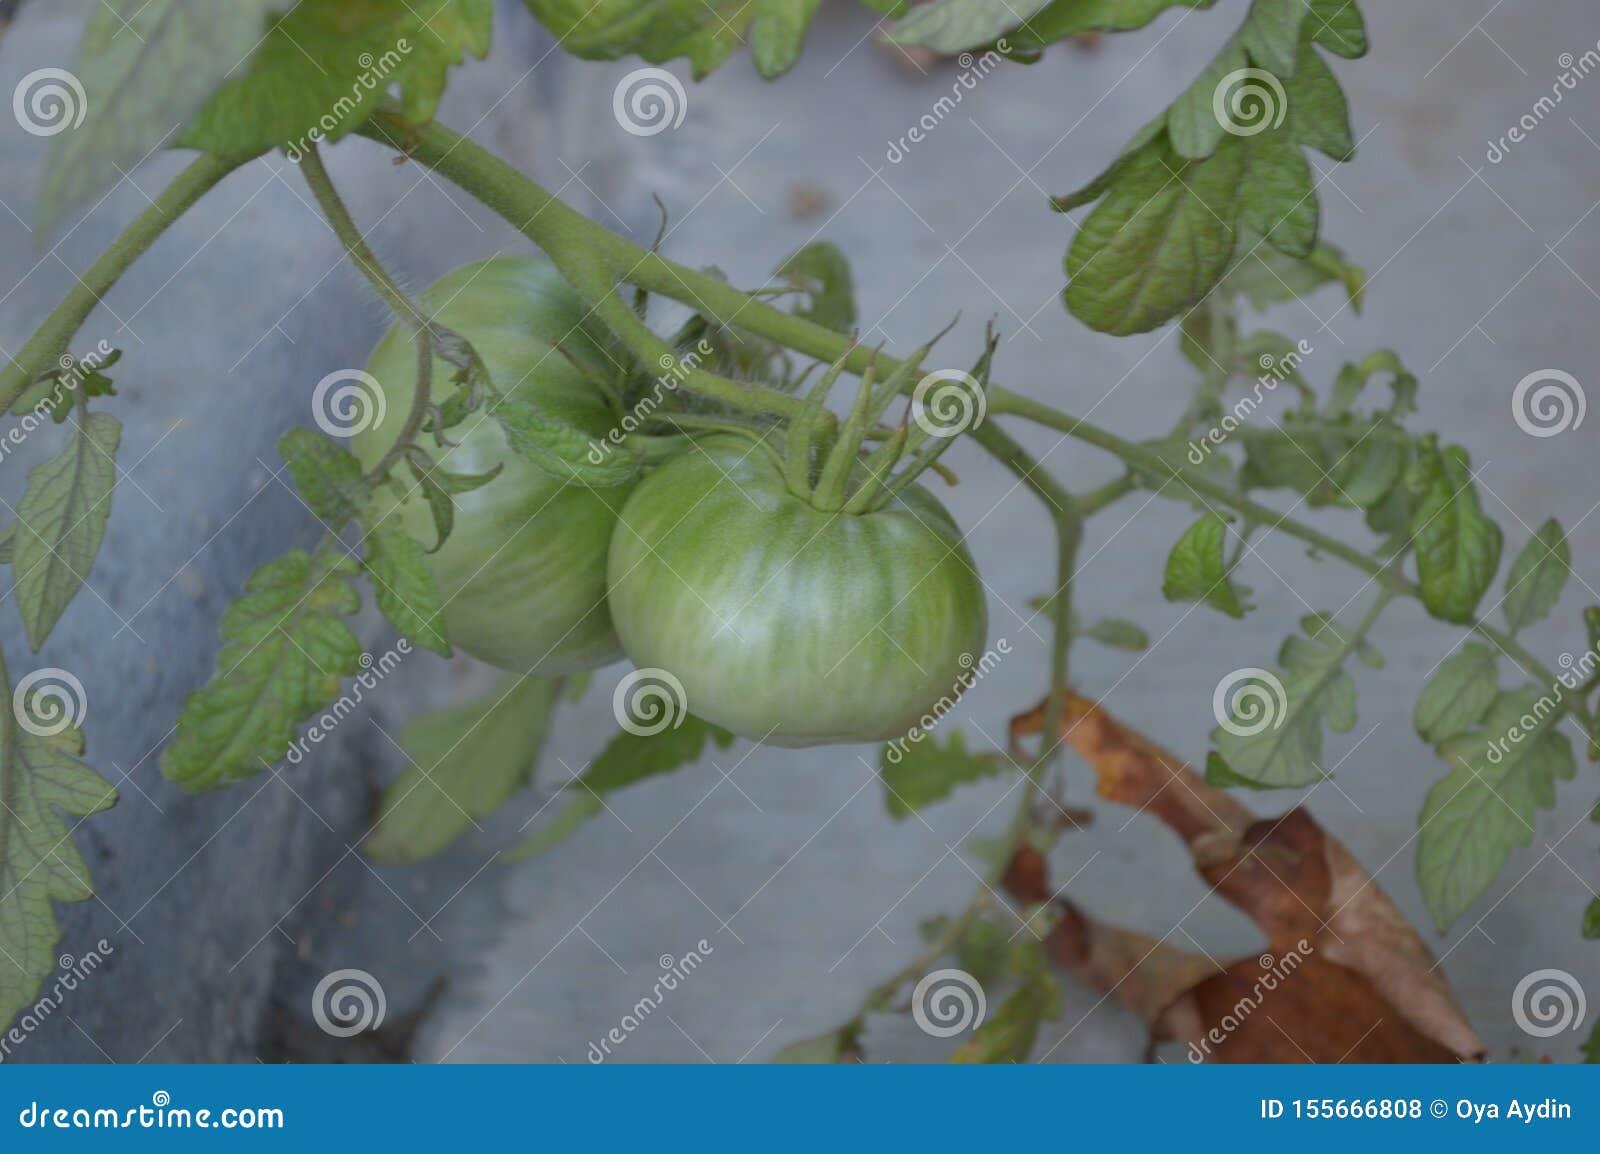 Taze yeșil domates